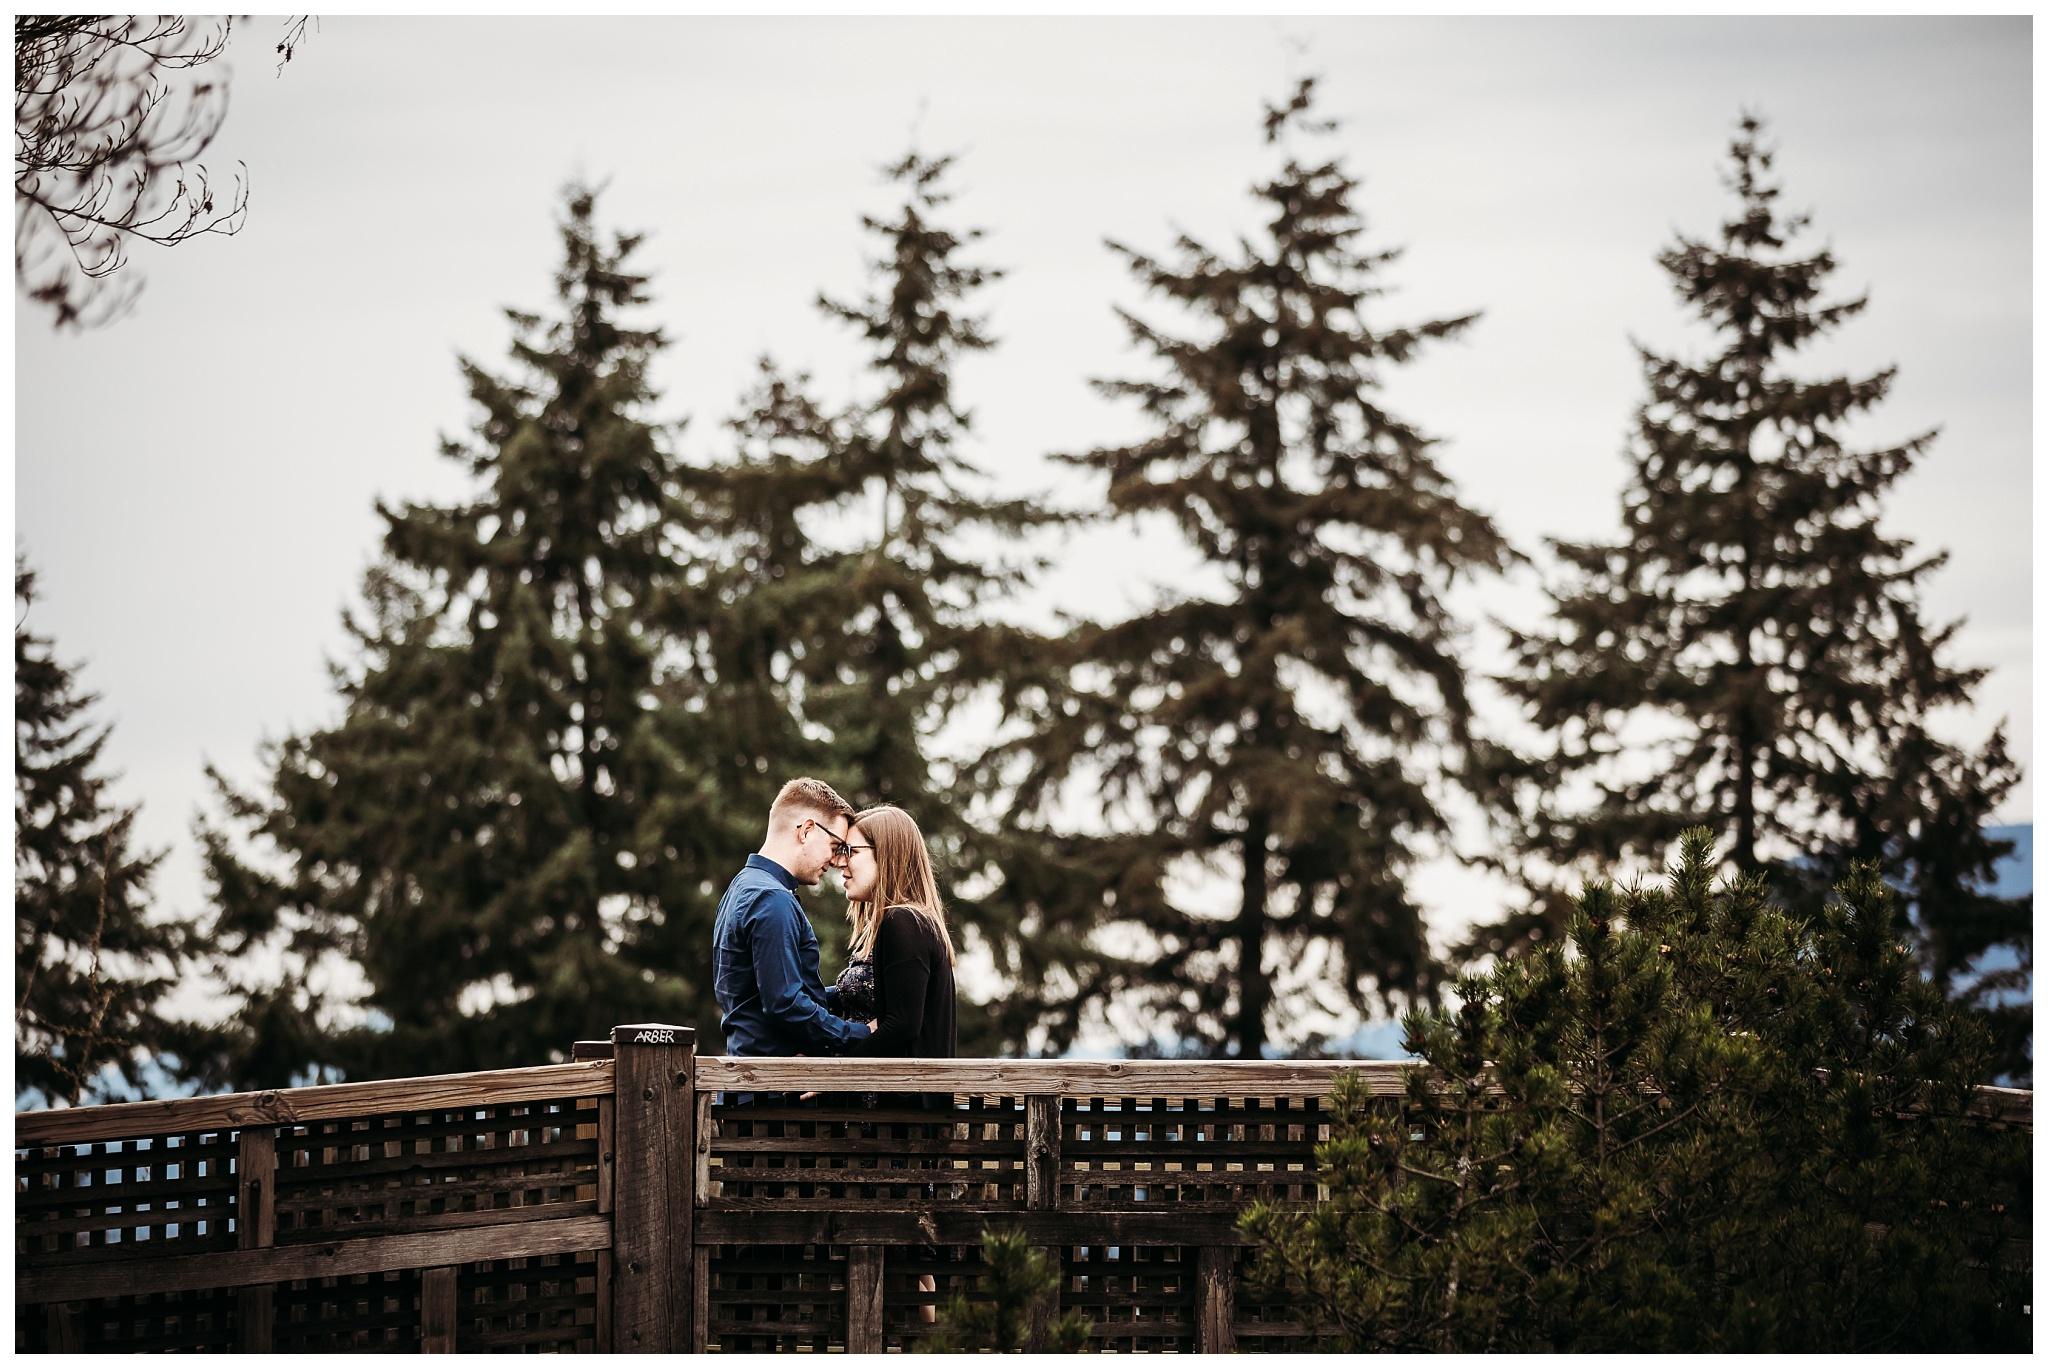 Queen Elizabeth Park Spring Engagement Photography Cherry Blossom Photos Couple Romantic_0004.jpg